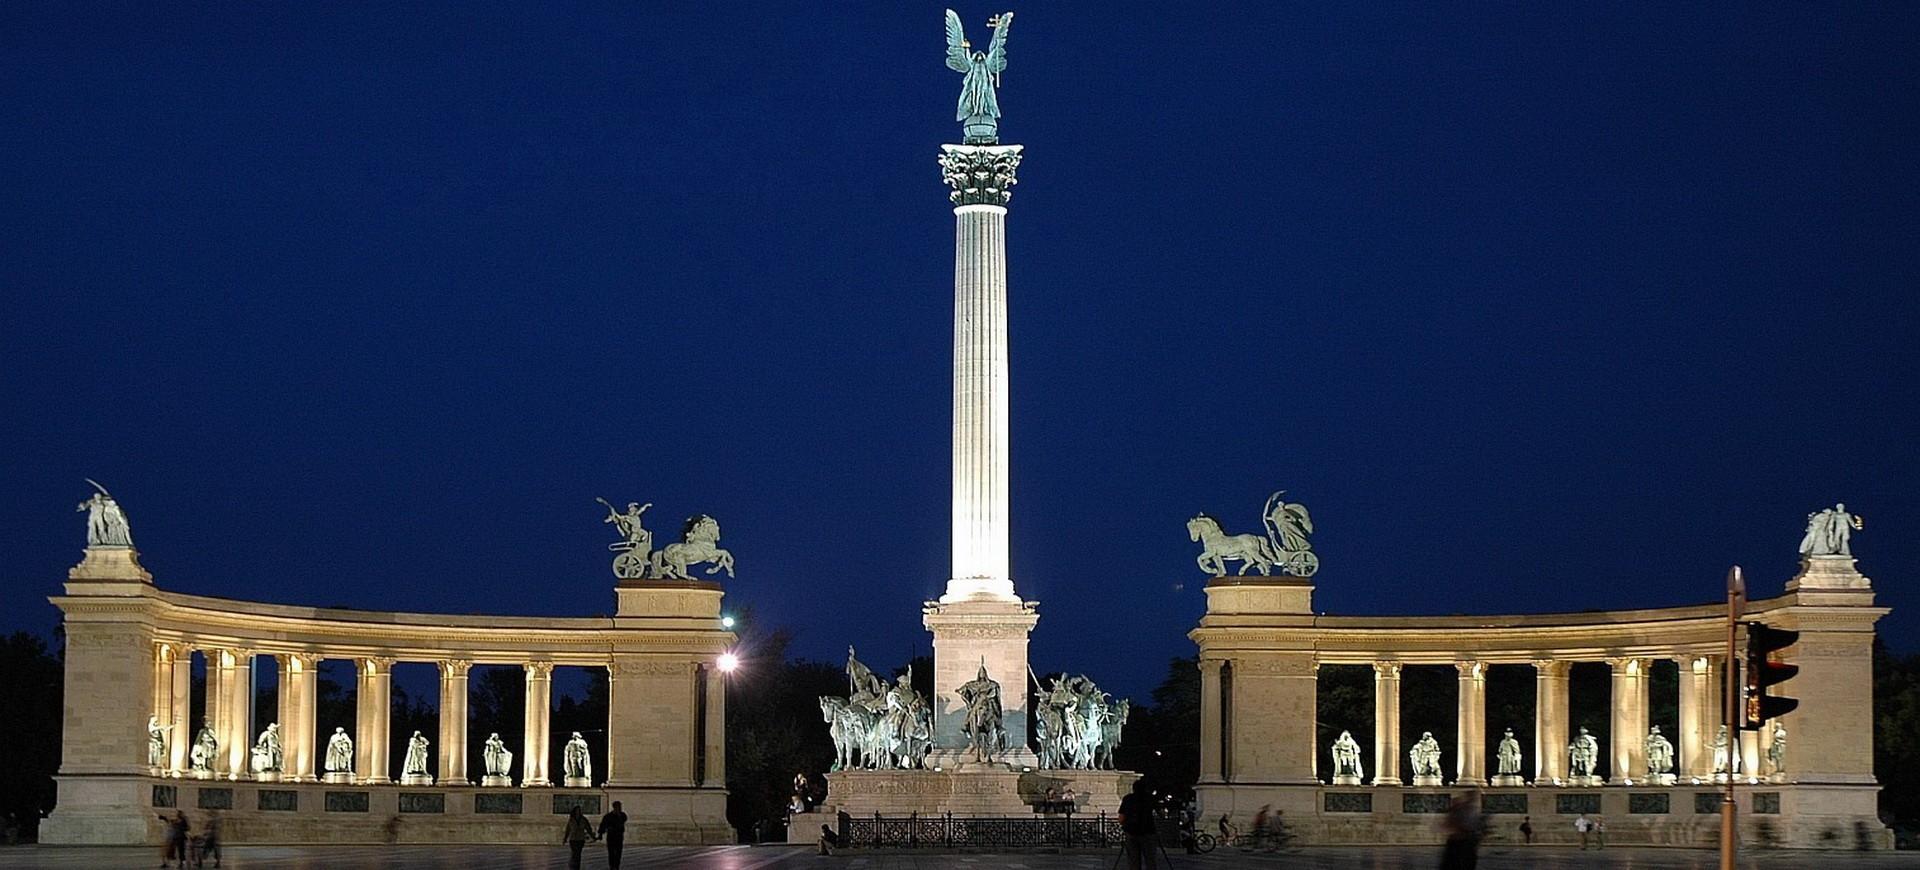 Place des Héros à Budapest by night